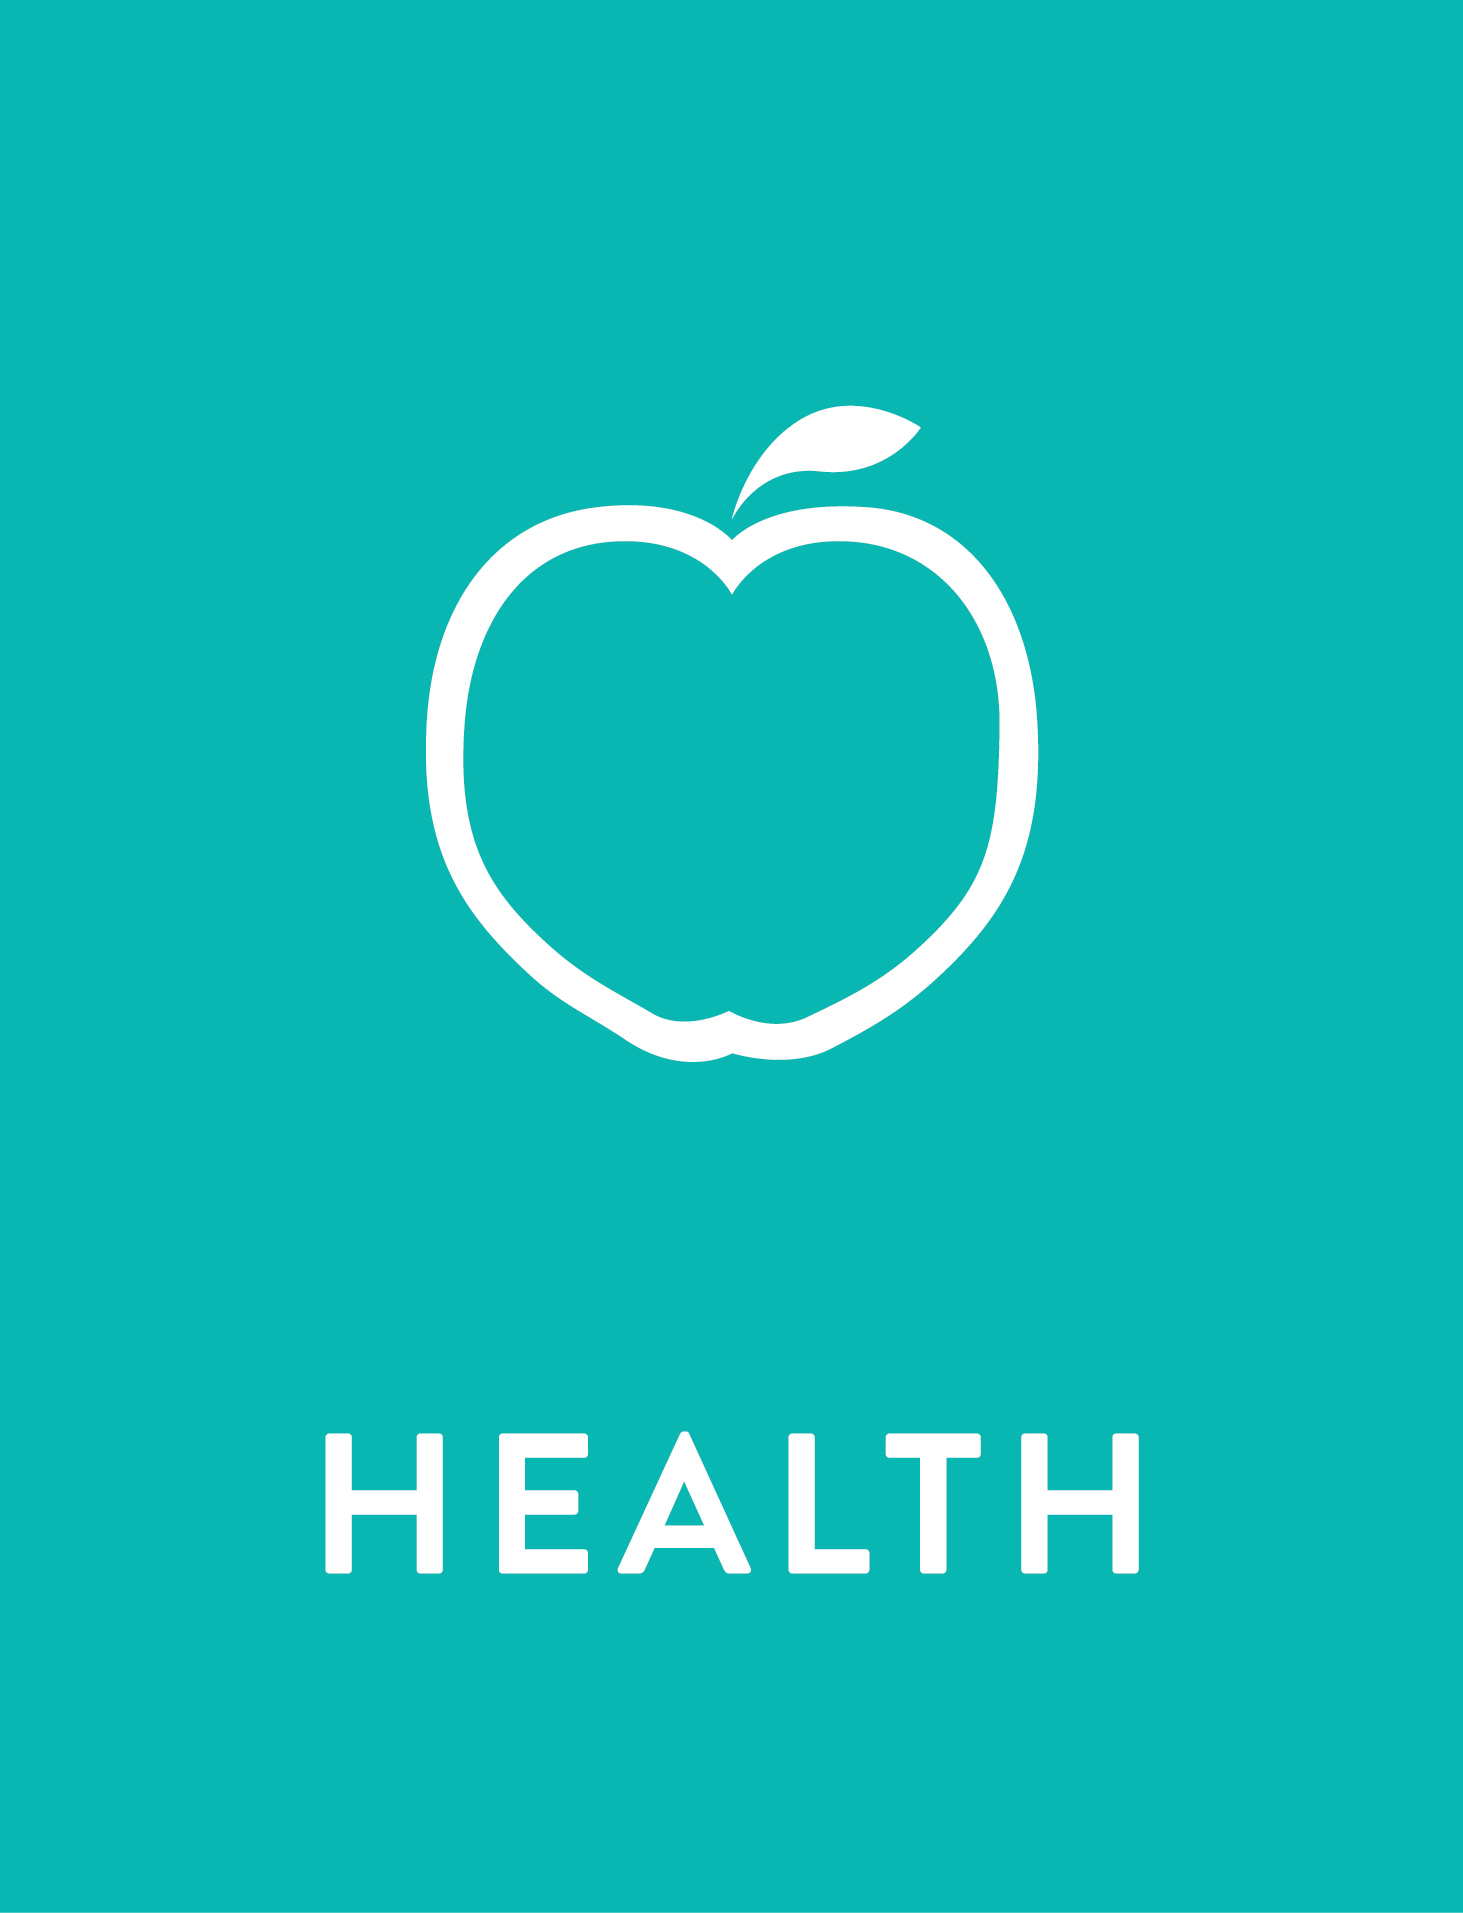 _4H_Icons_4_Health.jpg